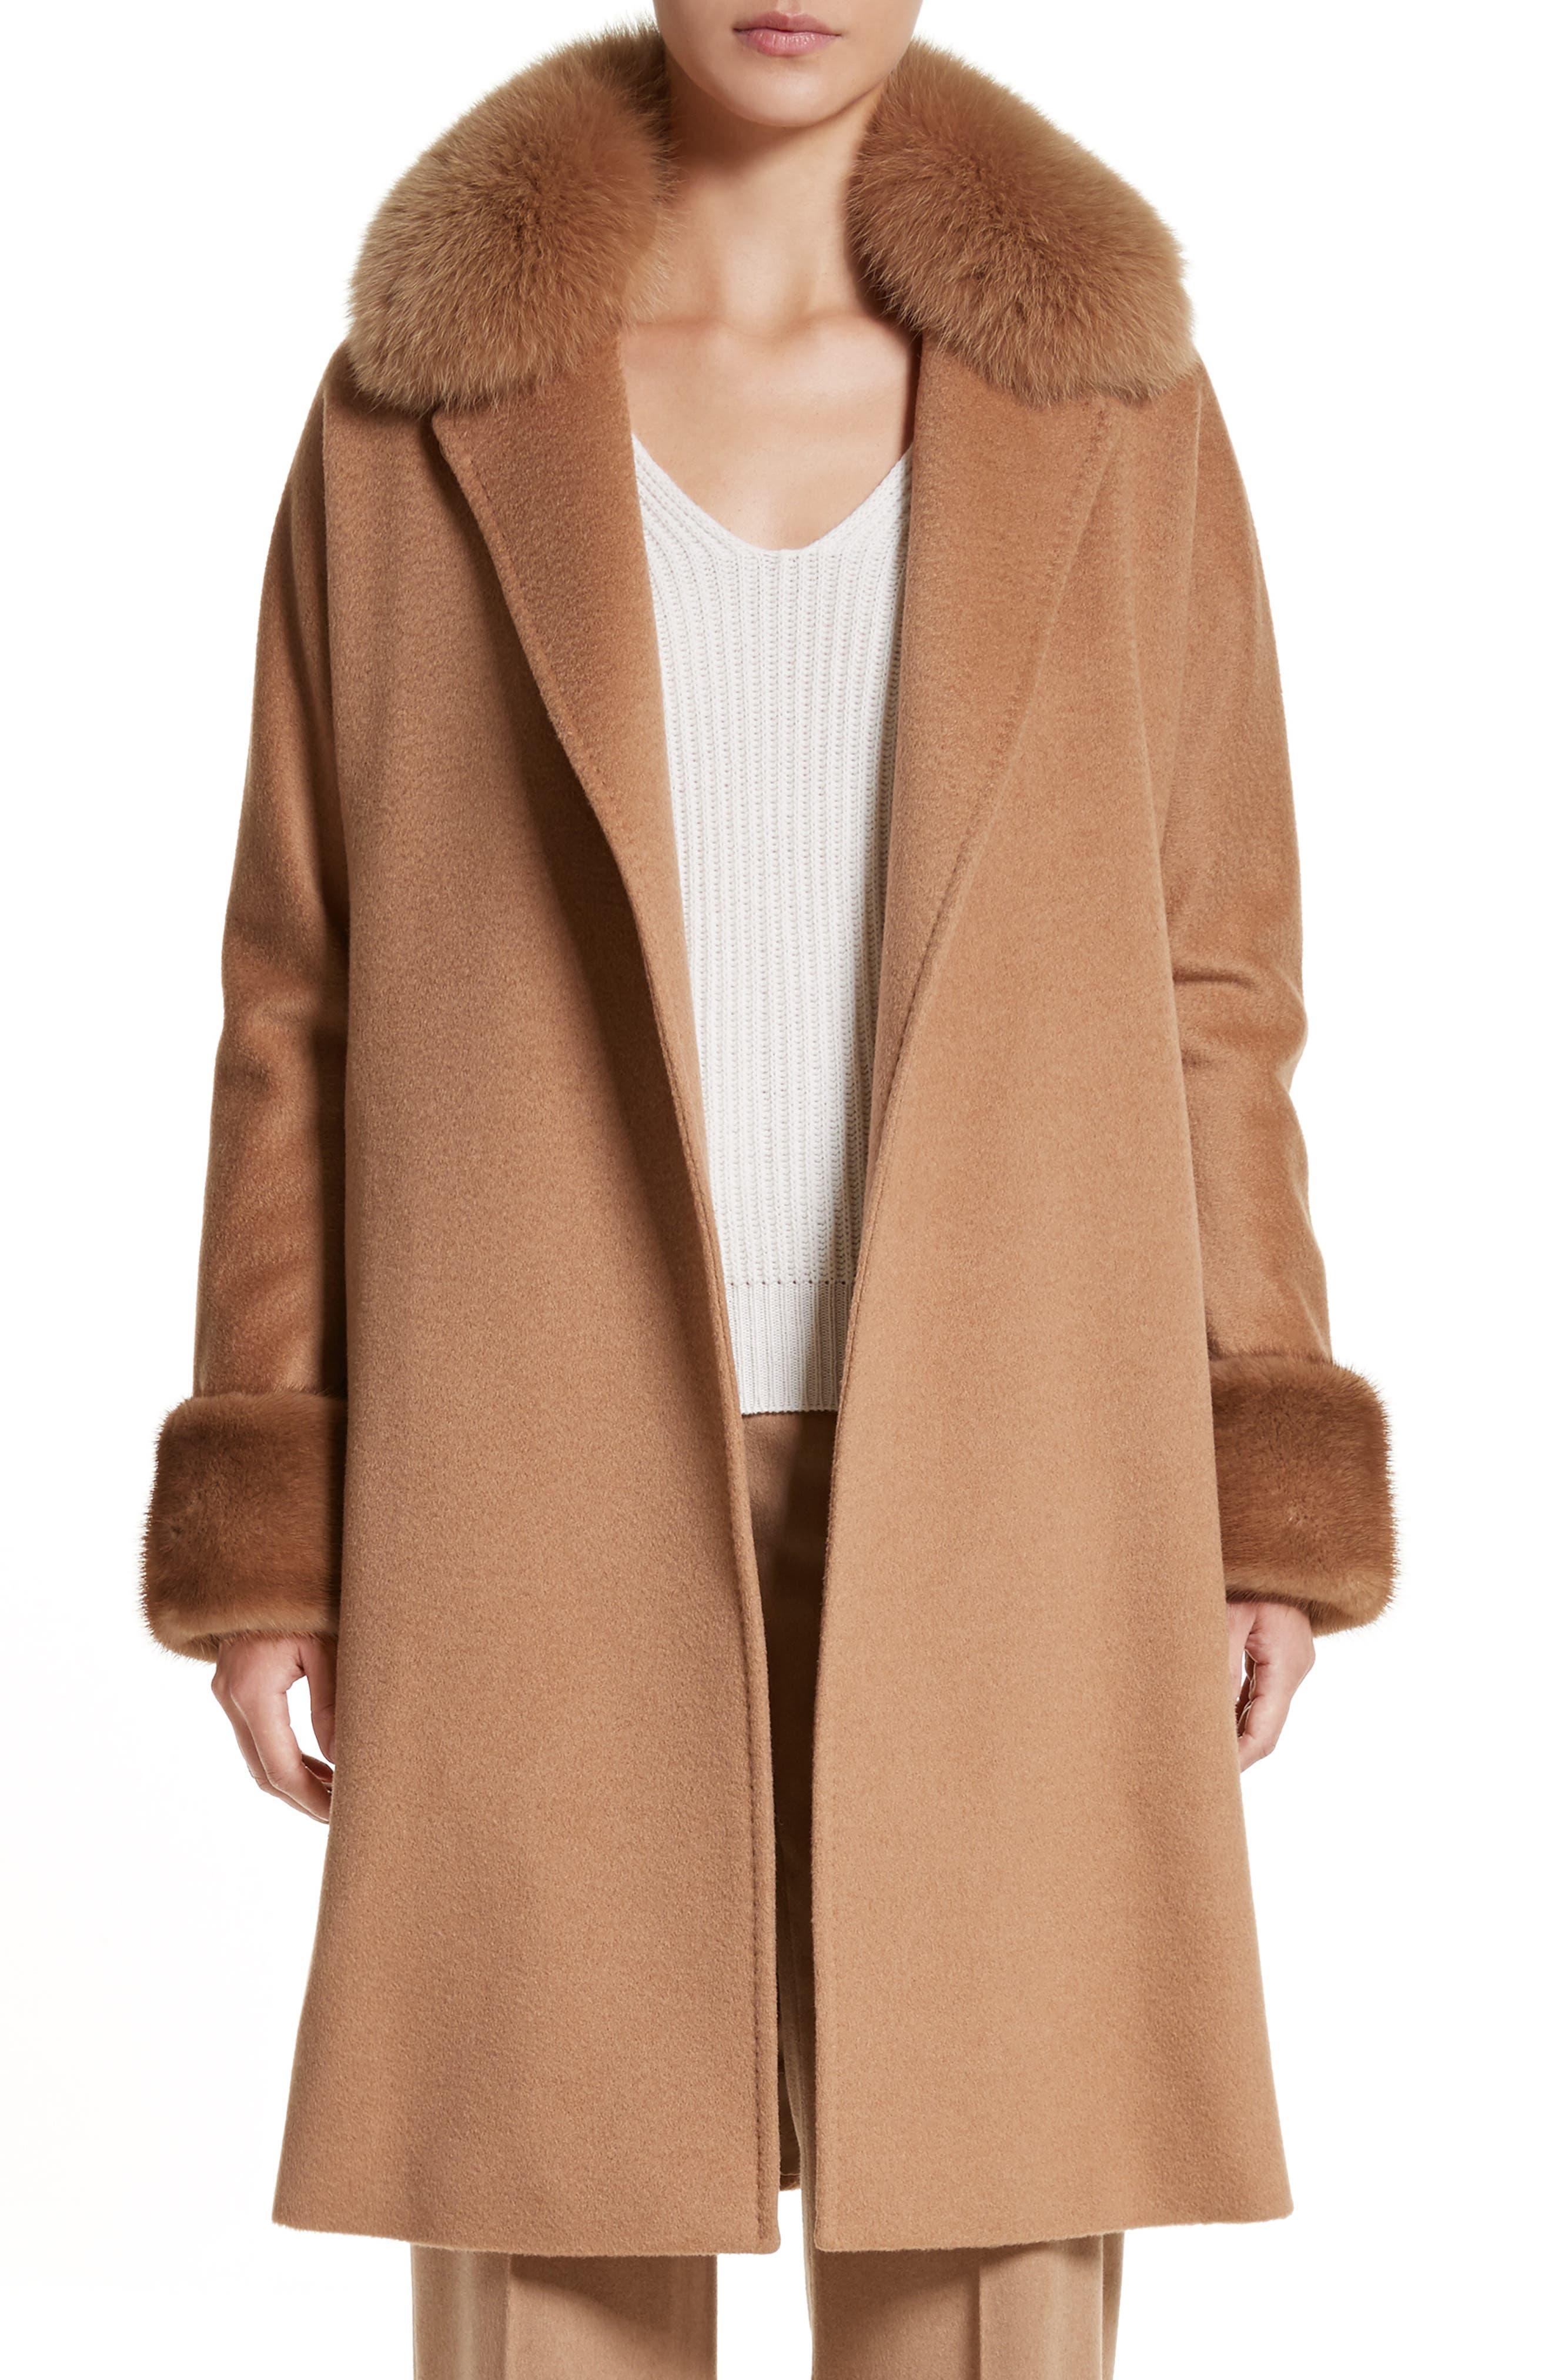 Camel Hair Coat with Genuine Fox Fur & Genuine Mink Fur Trim,                         Main,                         color, 232